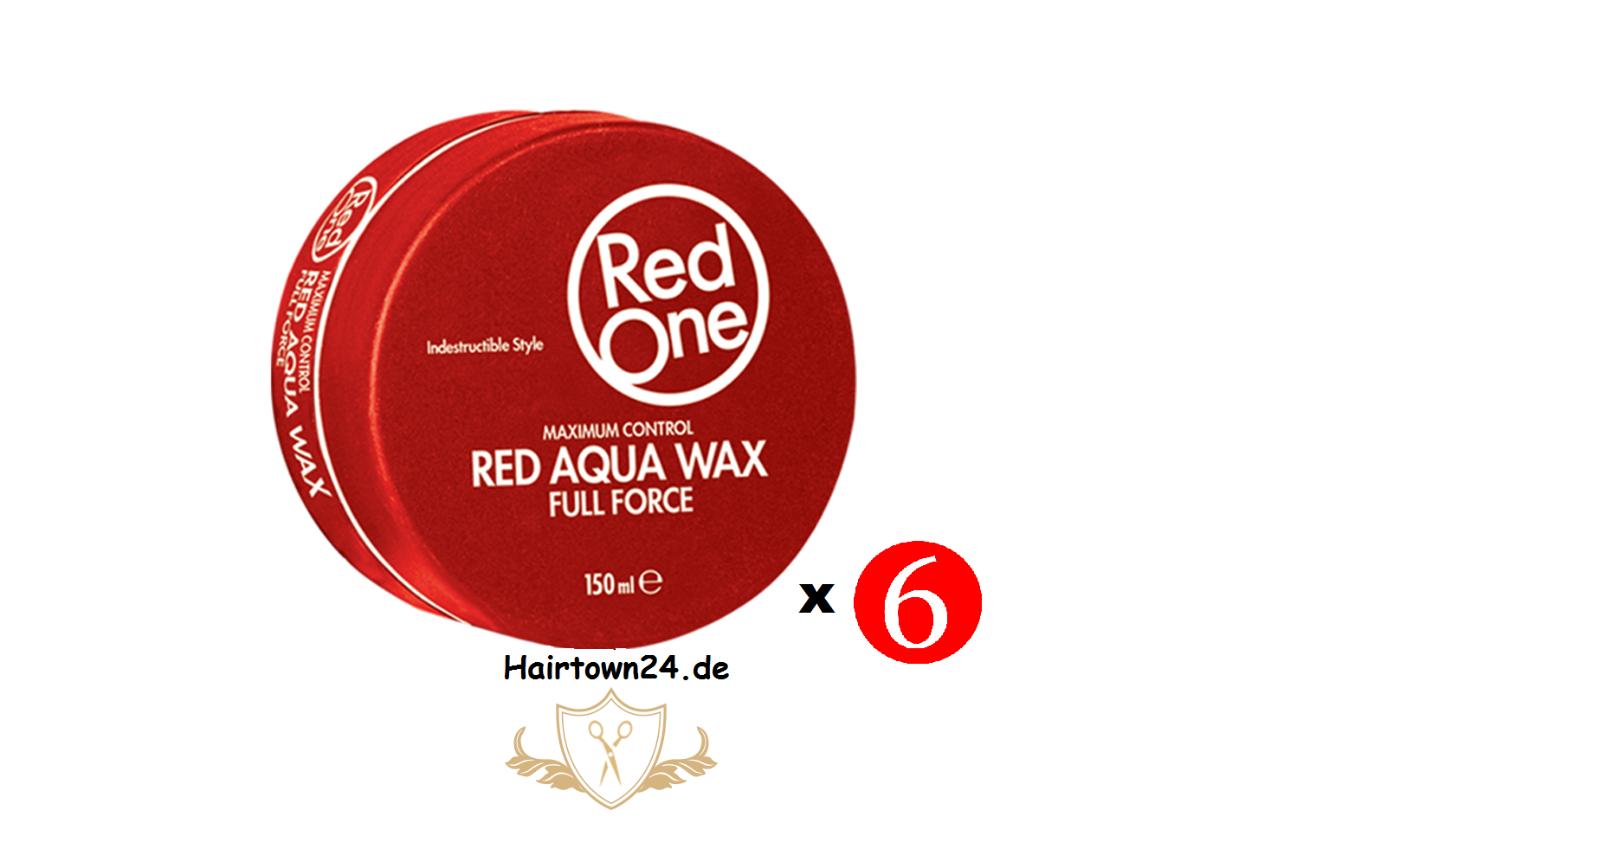 6x RedOne Gel Aqua Hair Wax Full Force Red Rot 150ml Haarwachs Gel-Wax Haargel